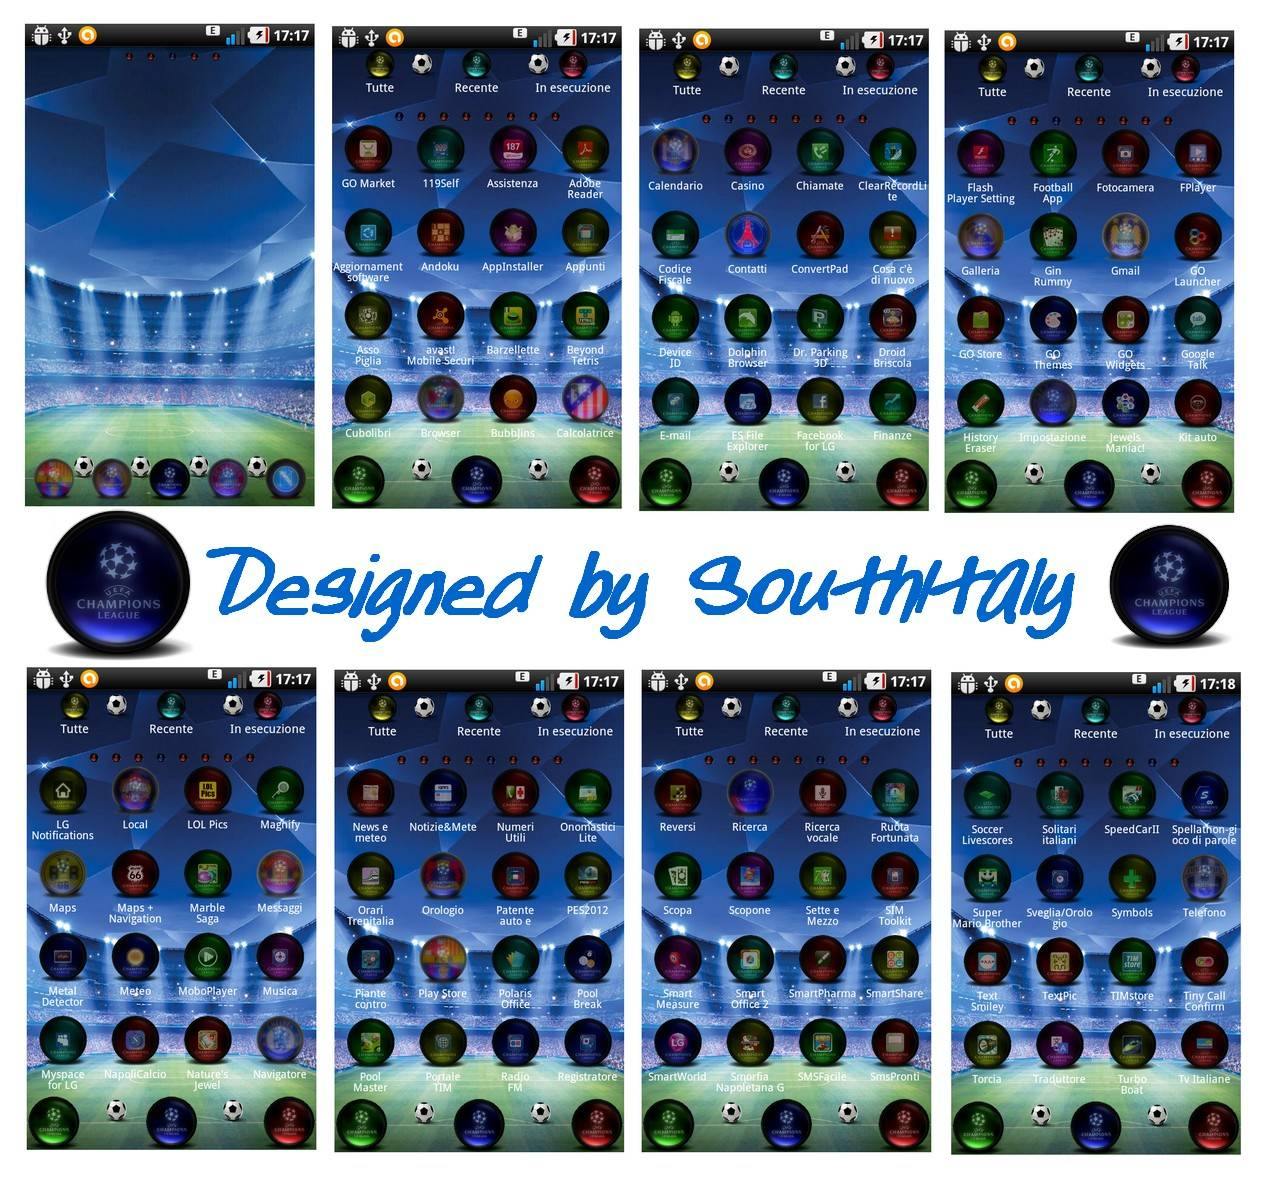 Uefa Champions Leaugue 14 Beta theme